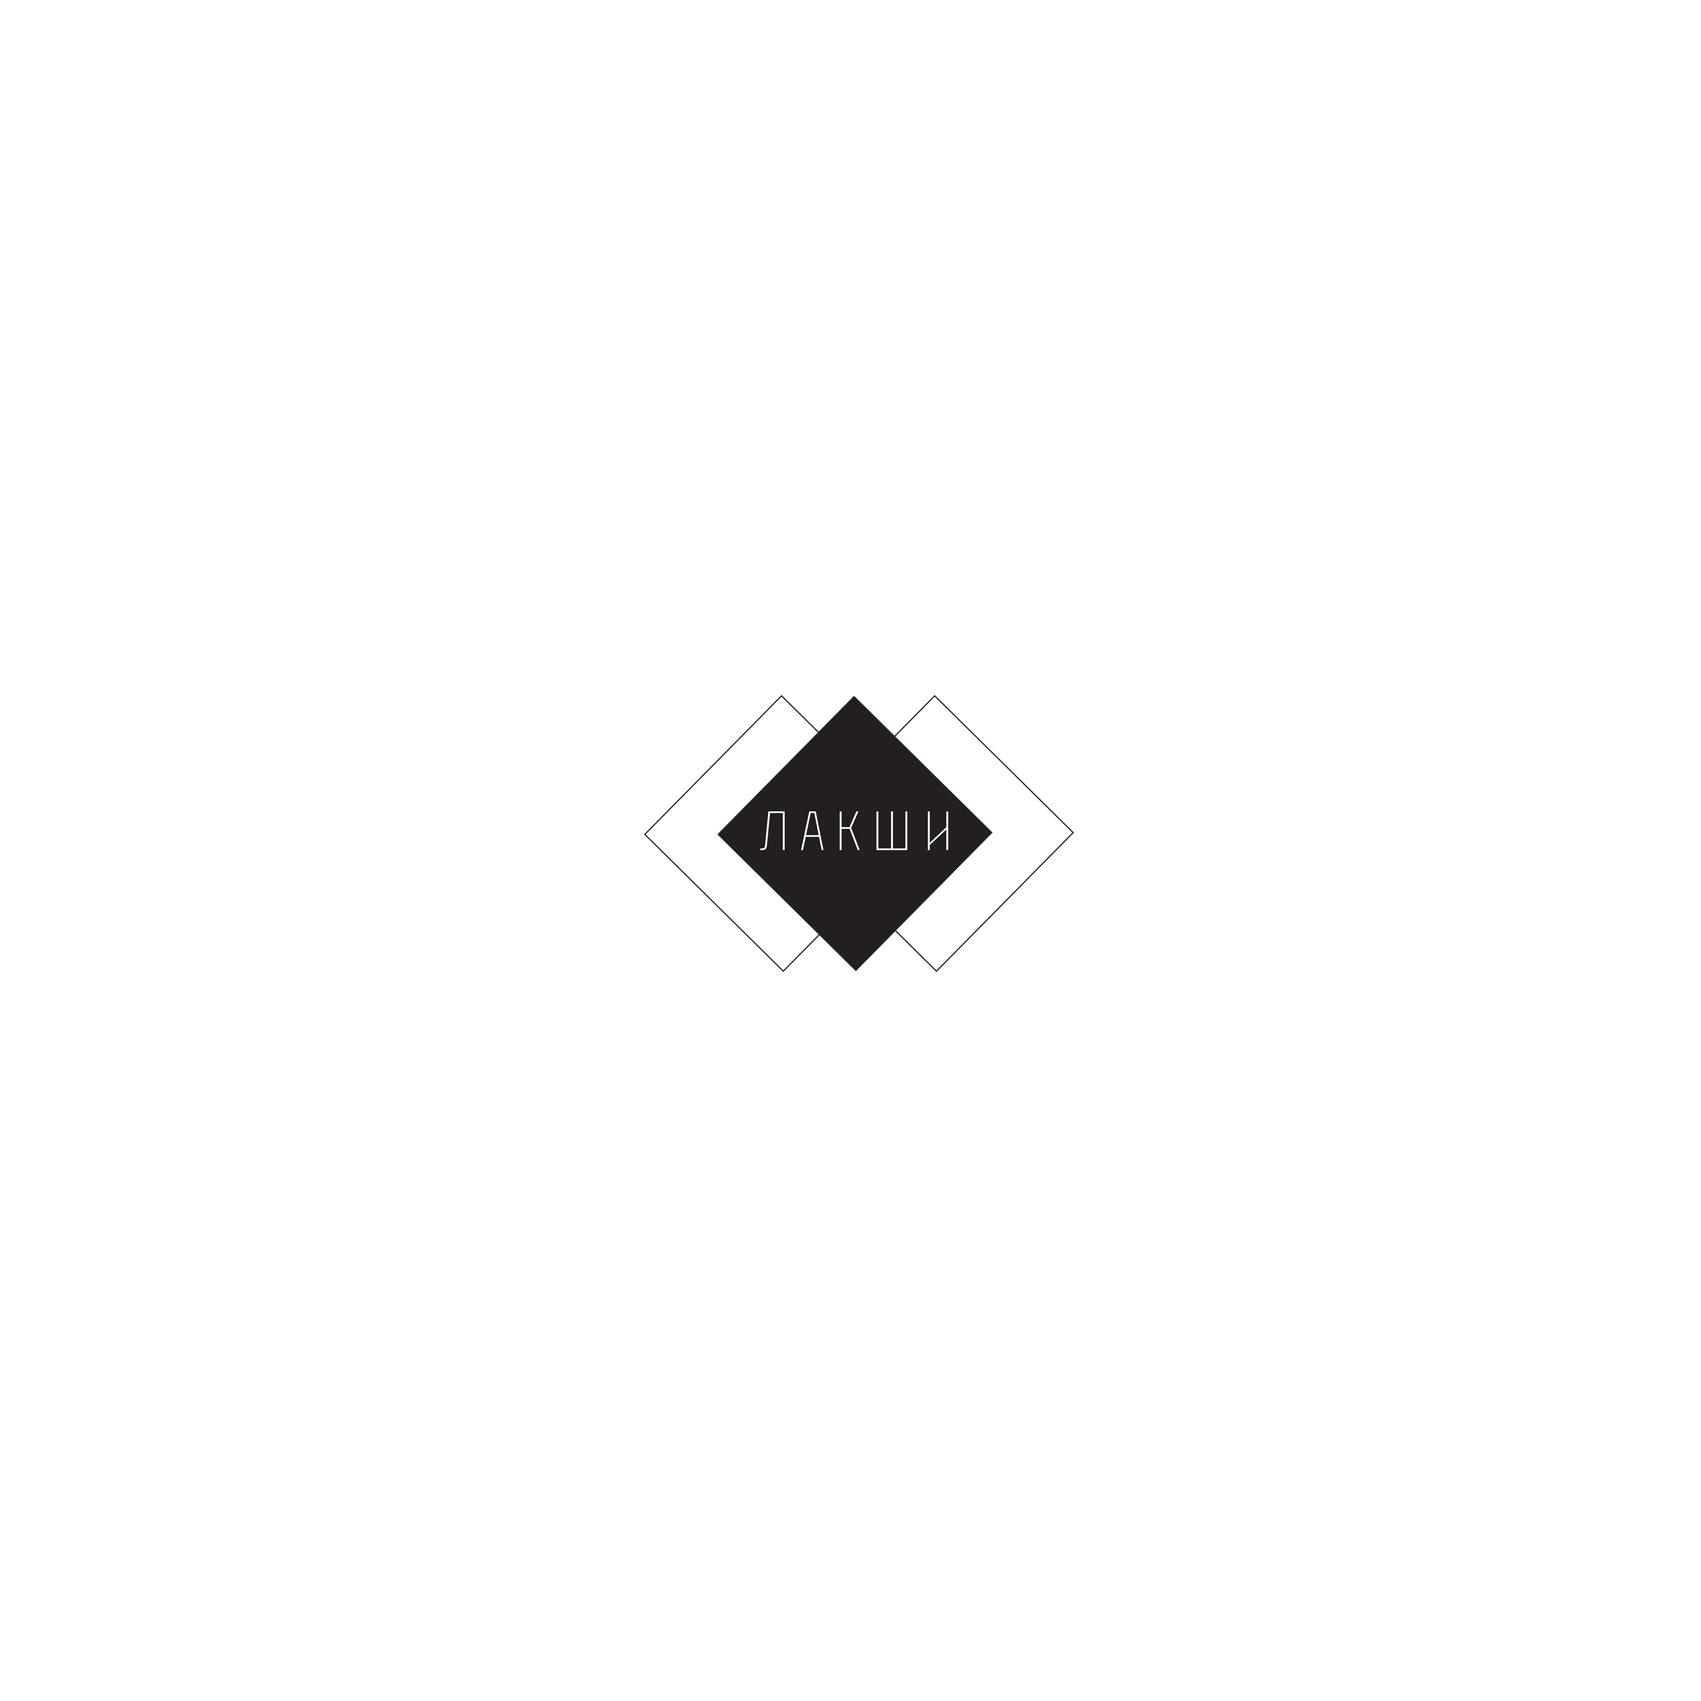 Разработка логотипа фирменного стиля фото f_2565c578bda9fcda.jpg